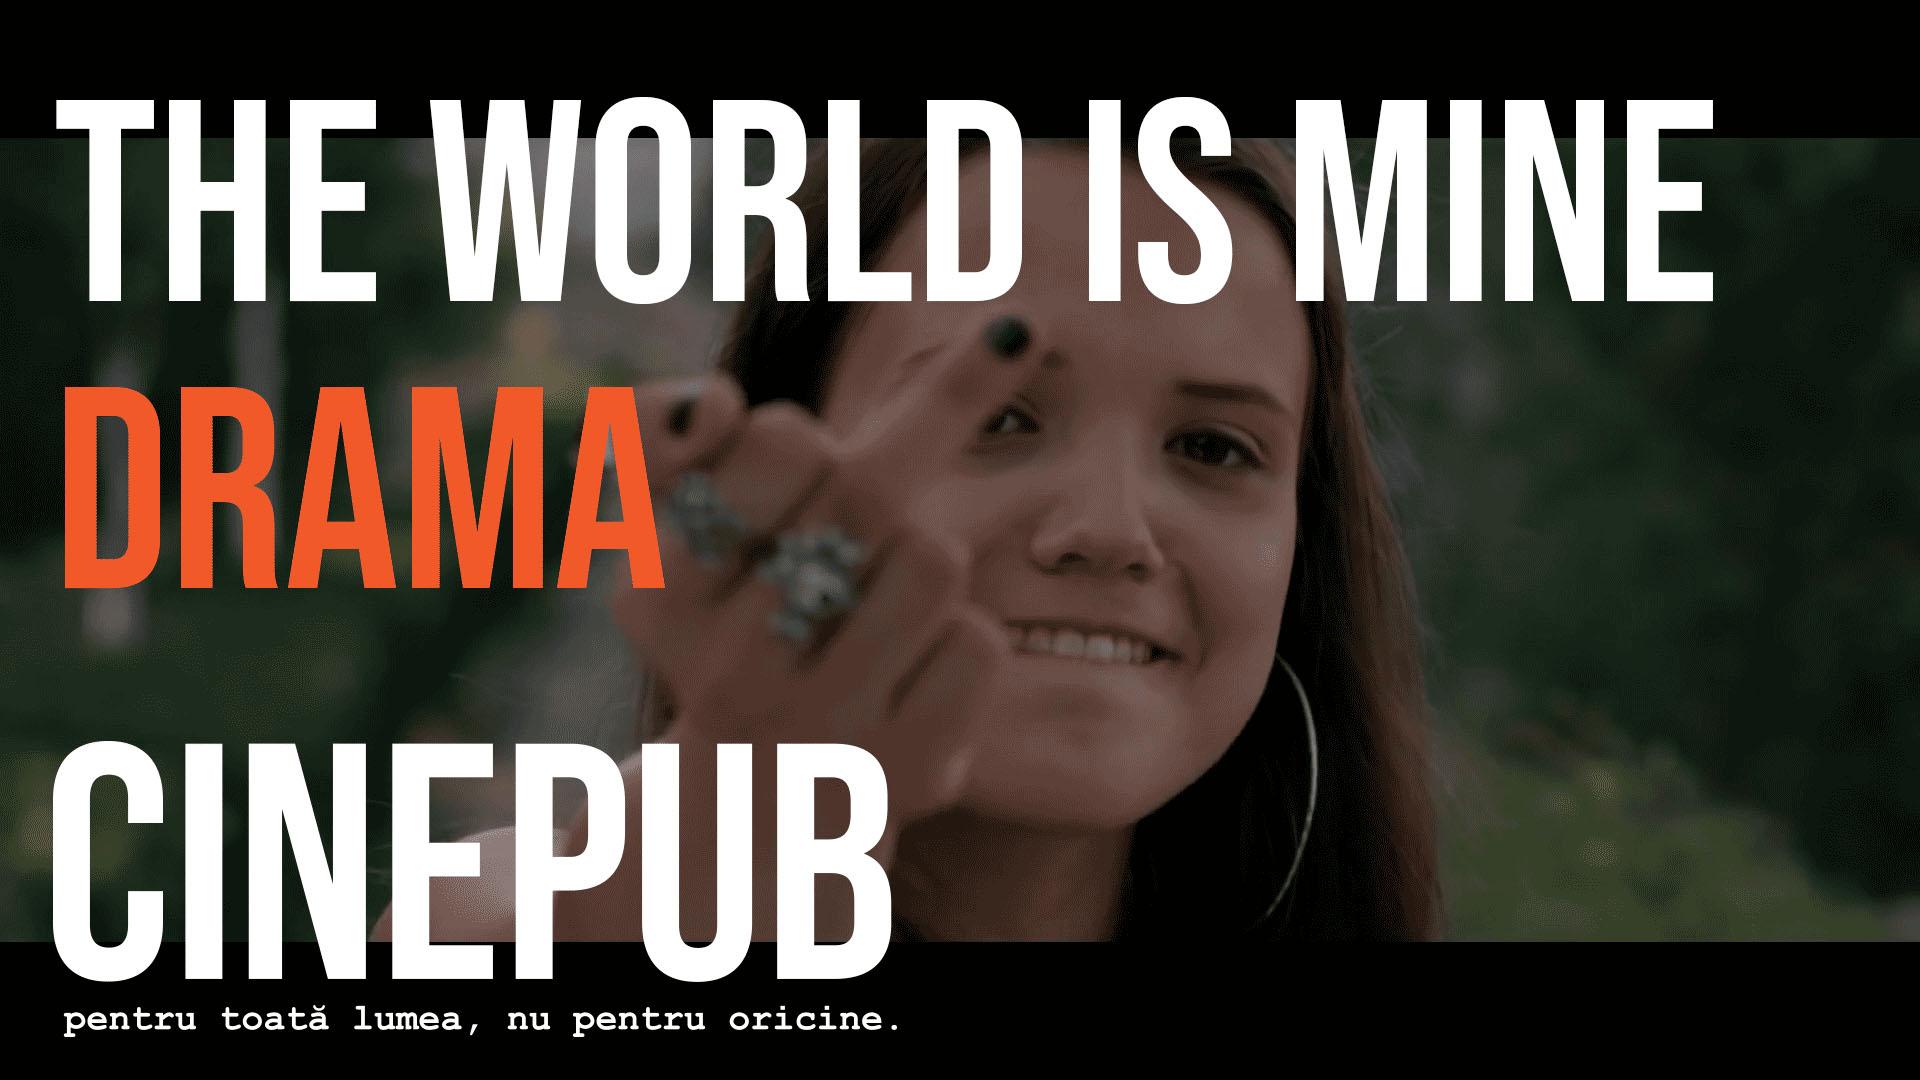 The world is mine - feature film online on CINEPUB